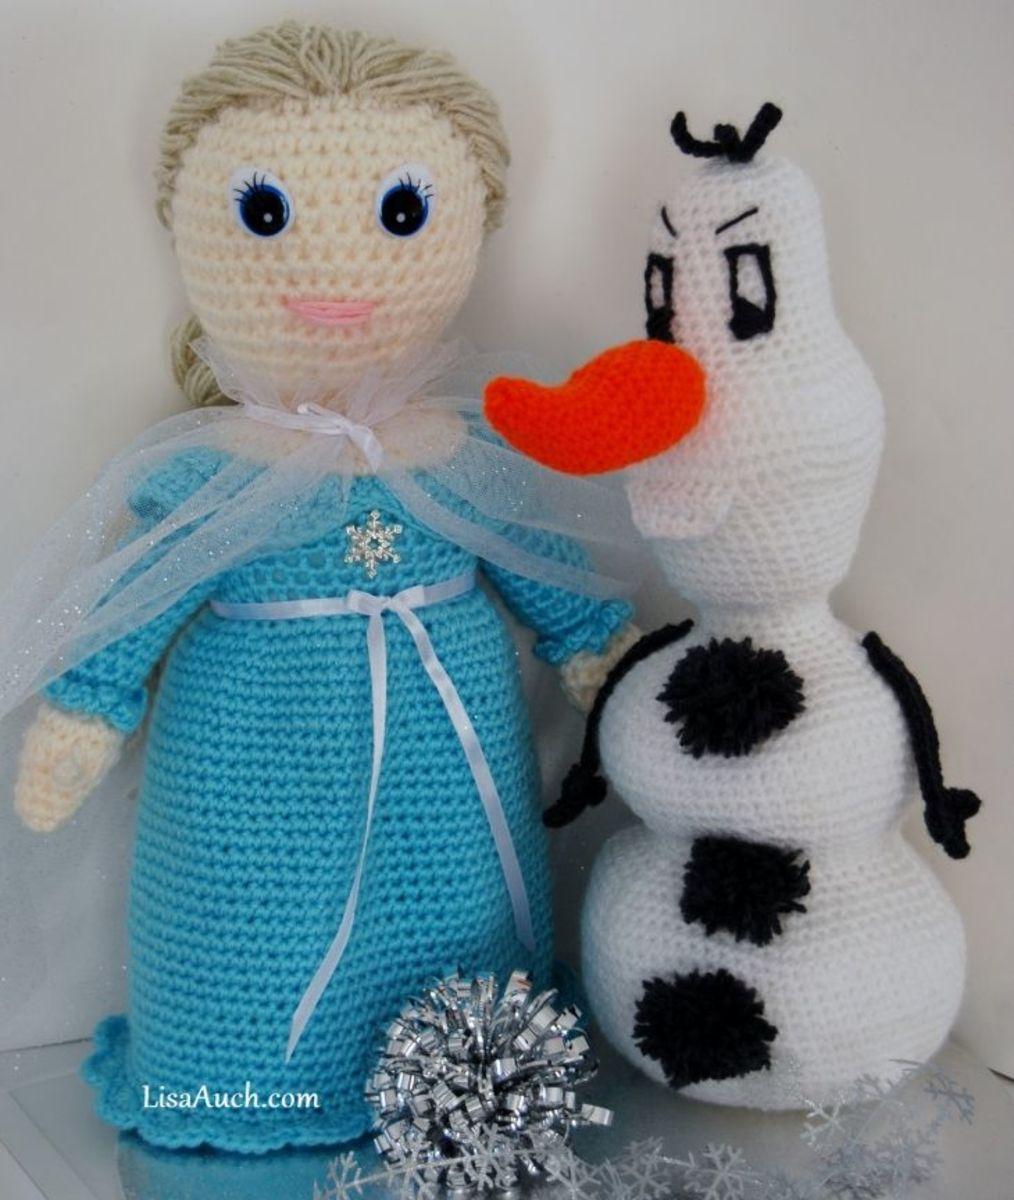 OLAF Crochet Patterns Ideas Free | Amigurumi, Patrón gratis ... | 1212x1024